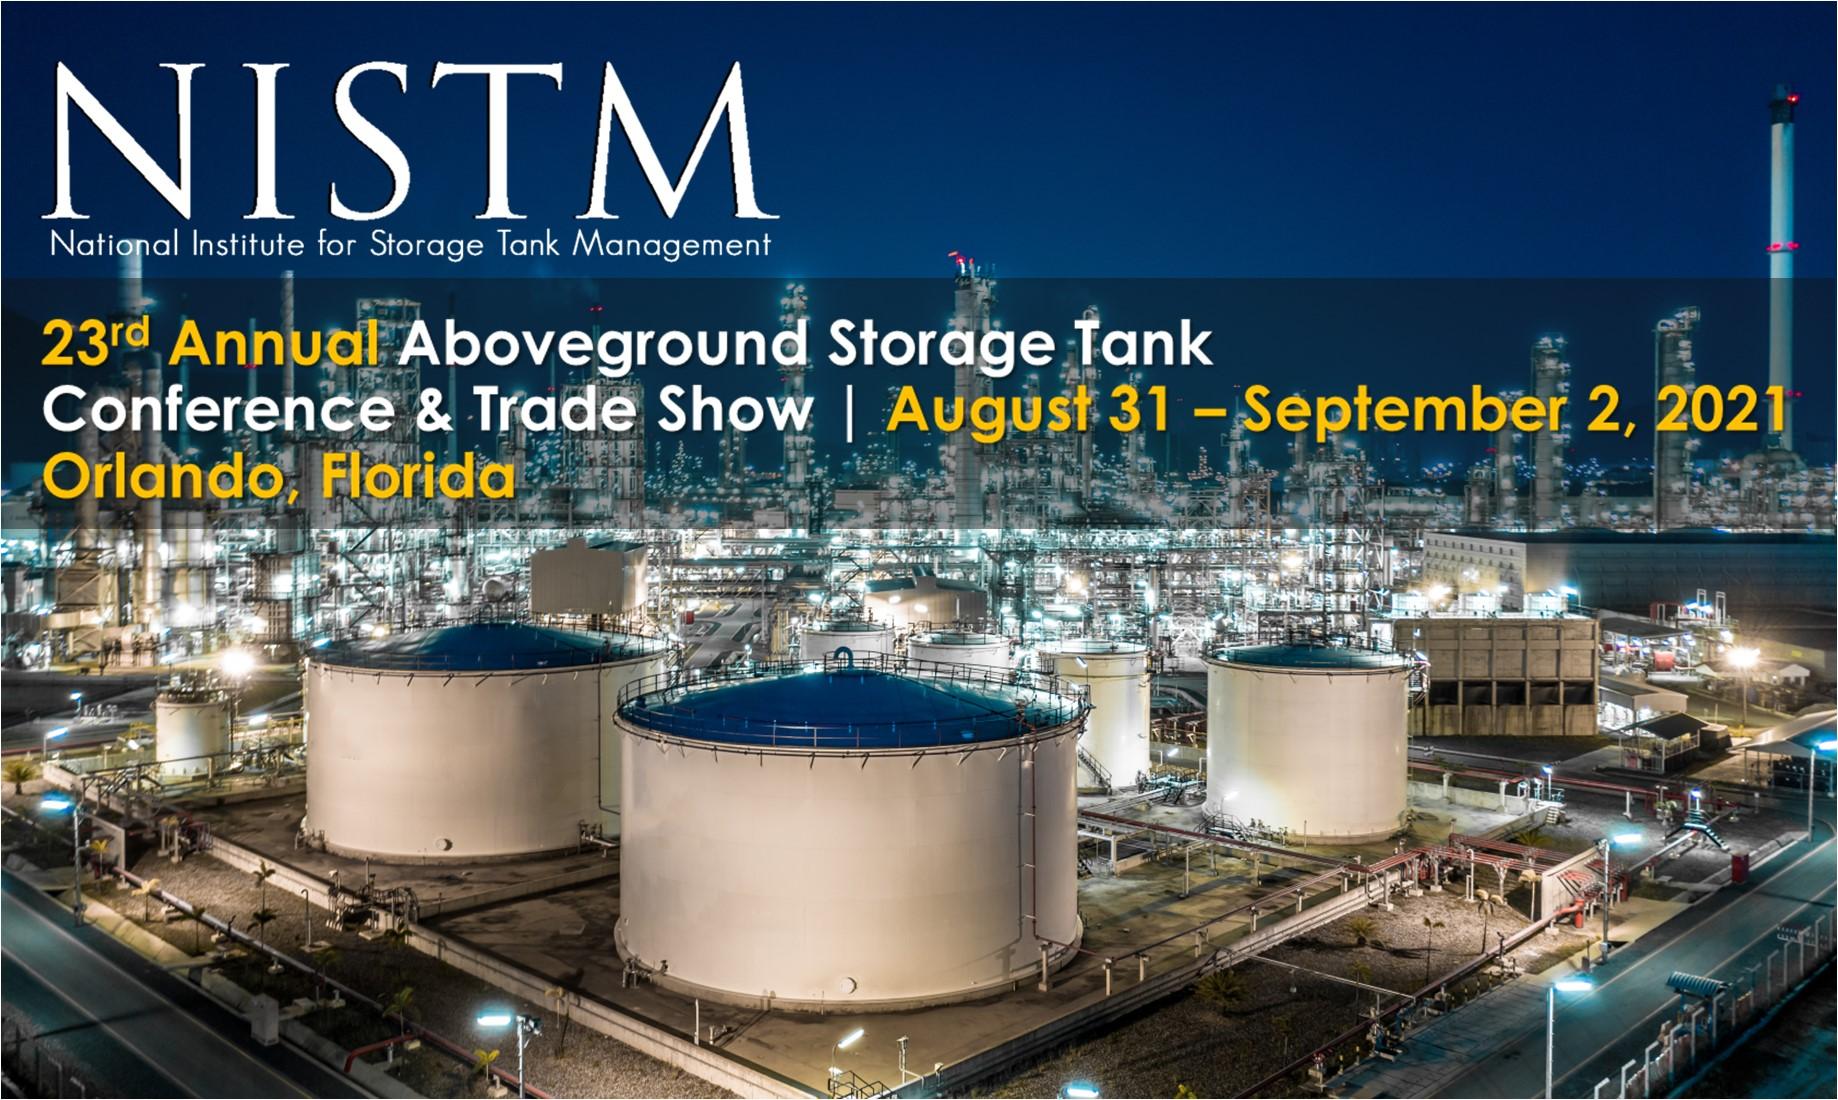 23rd Annual NISTM Aboveground Storage Tank Conference & Trade Show, Orlando, Fl